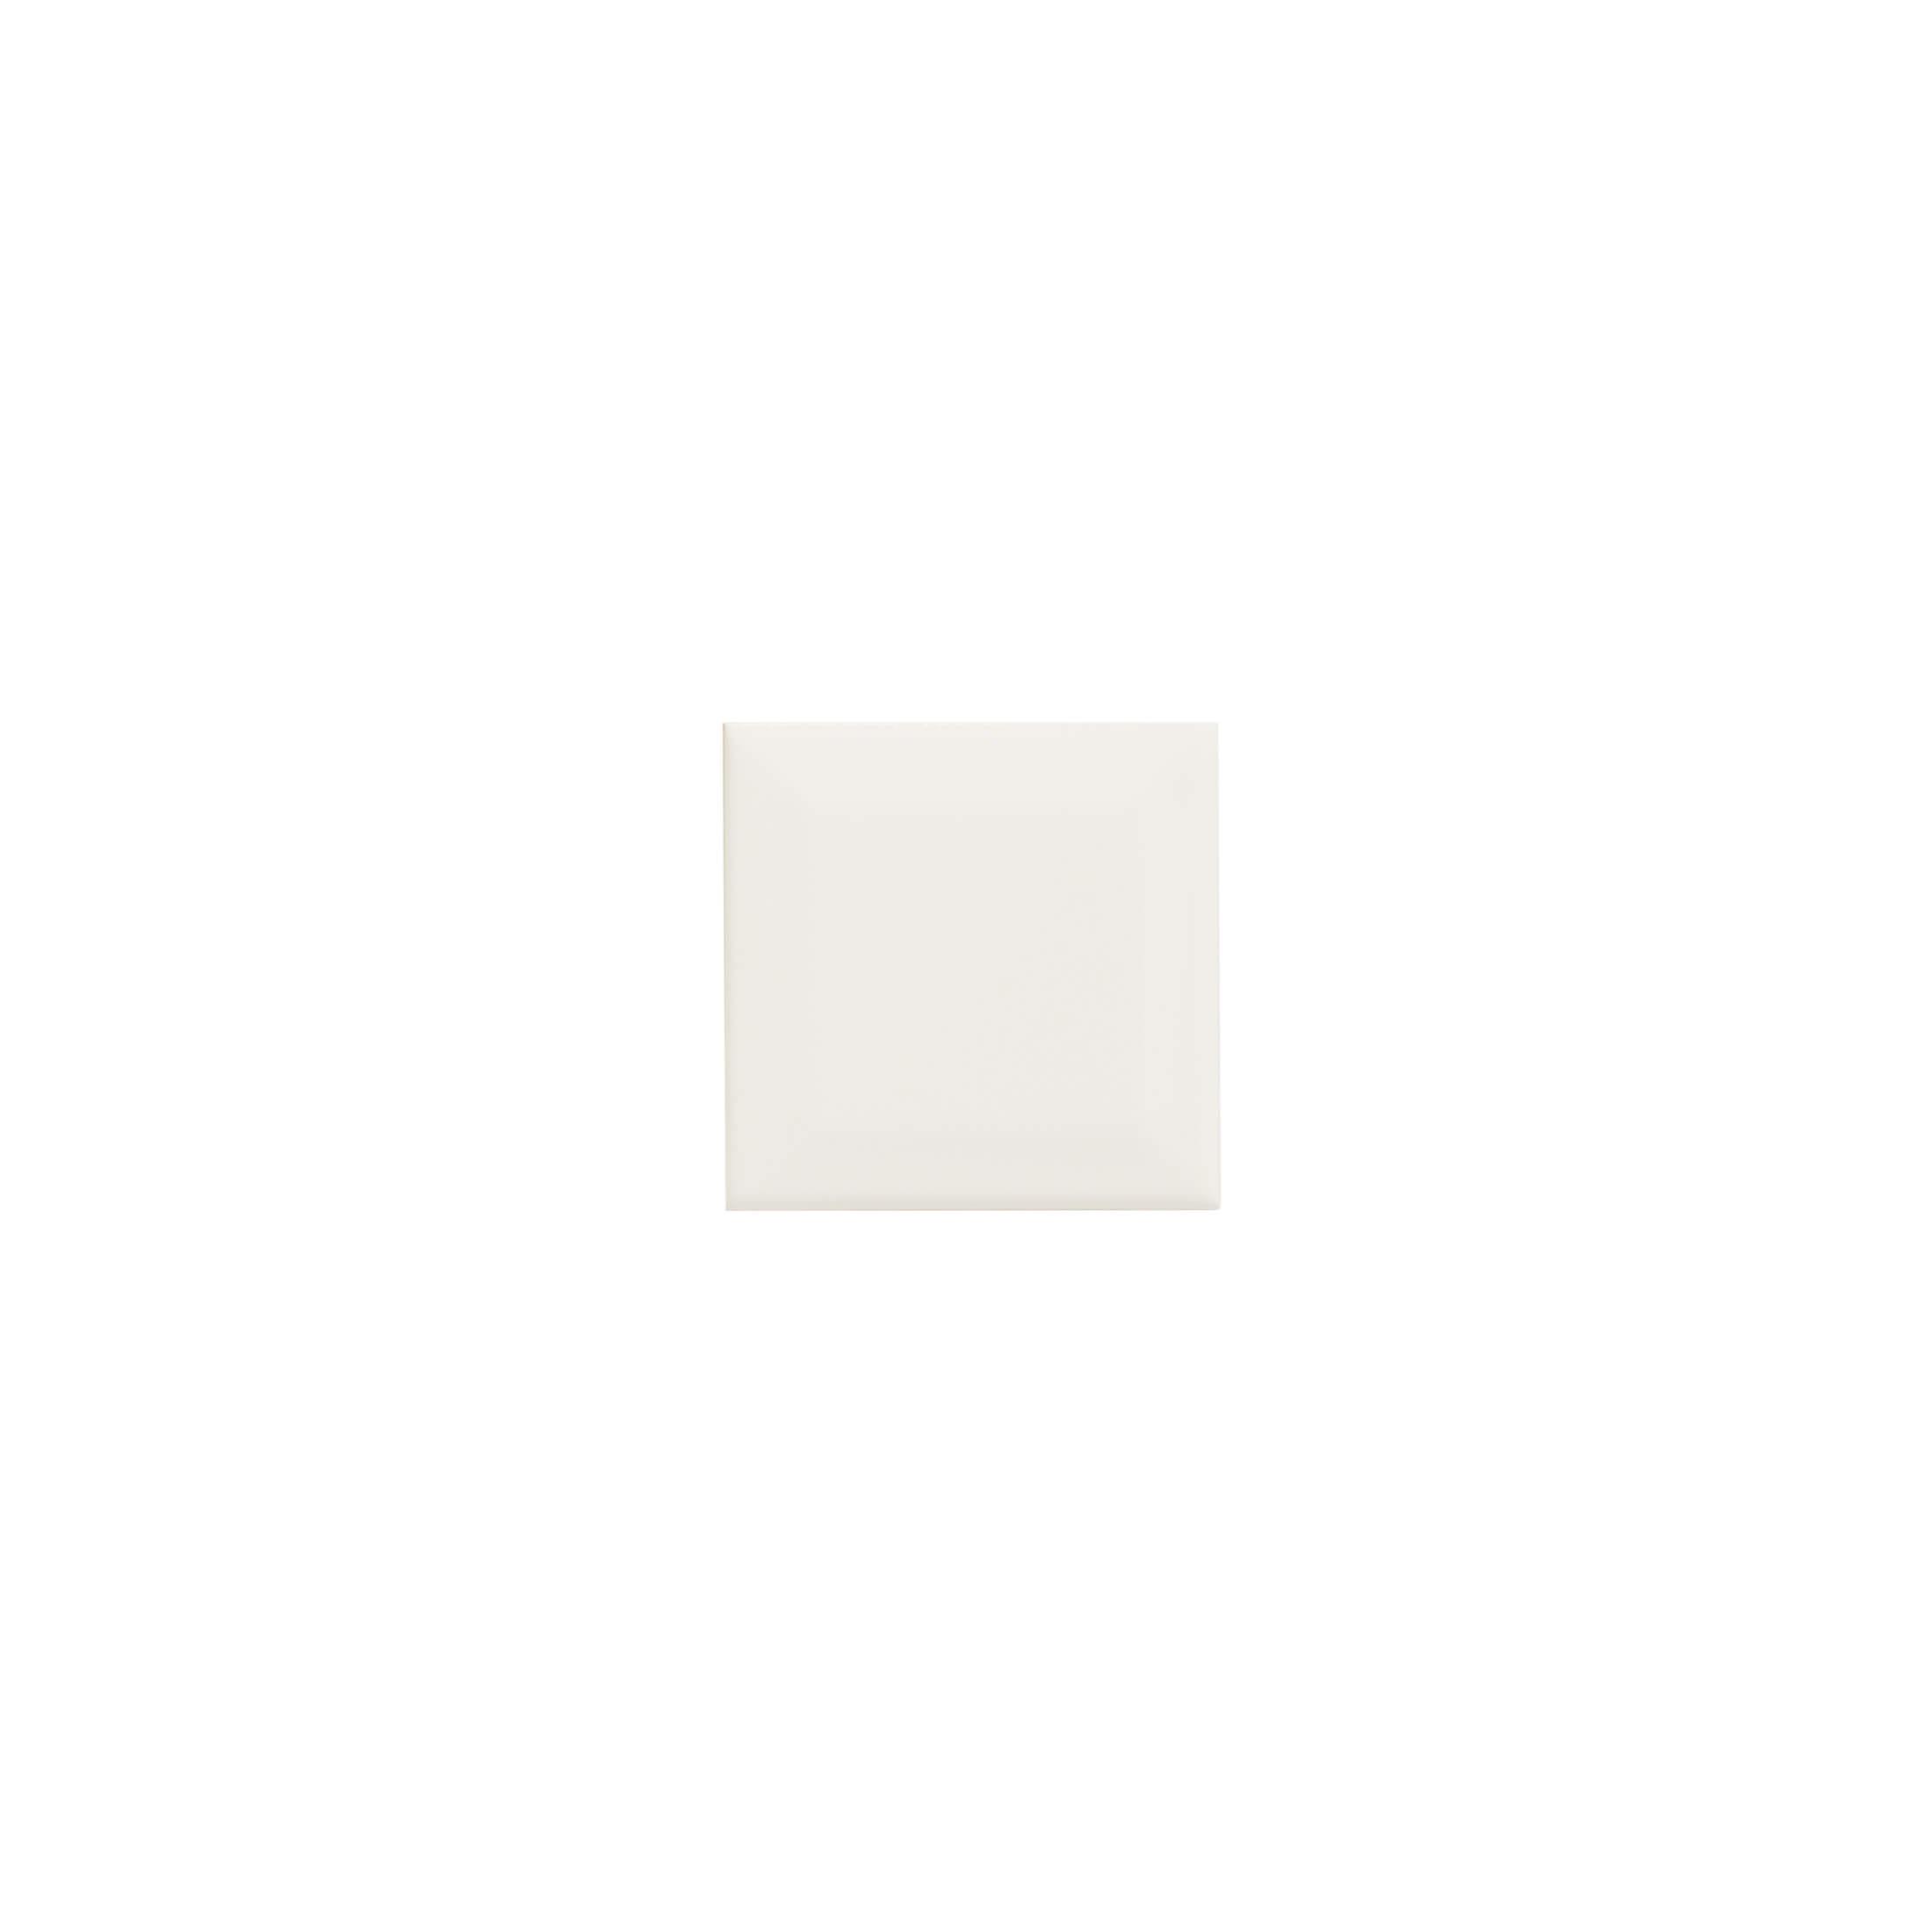 ADNE2035 - BISELADO PB - 7.5 cm X 7.5 cm